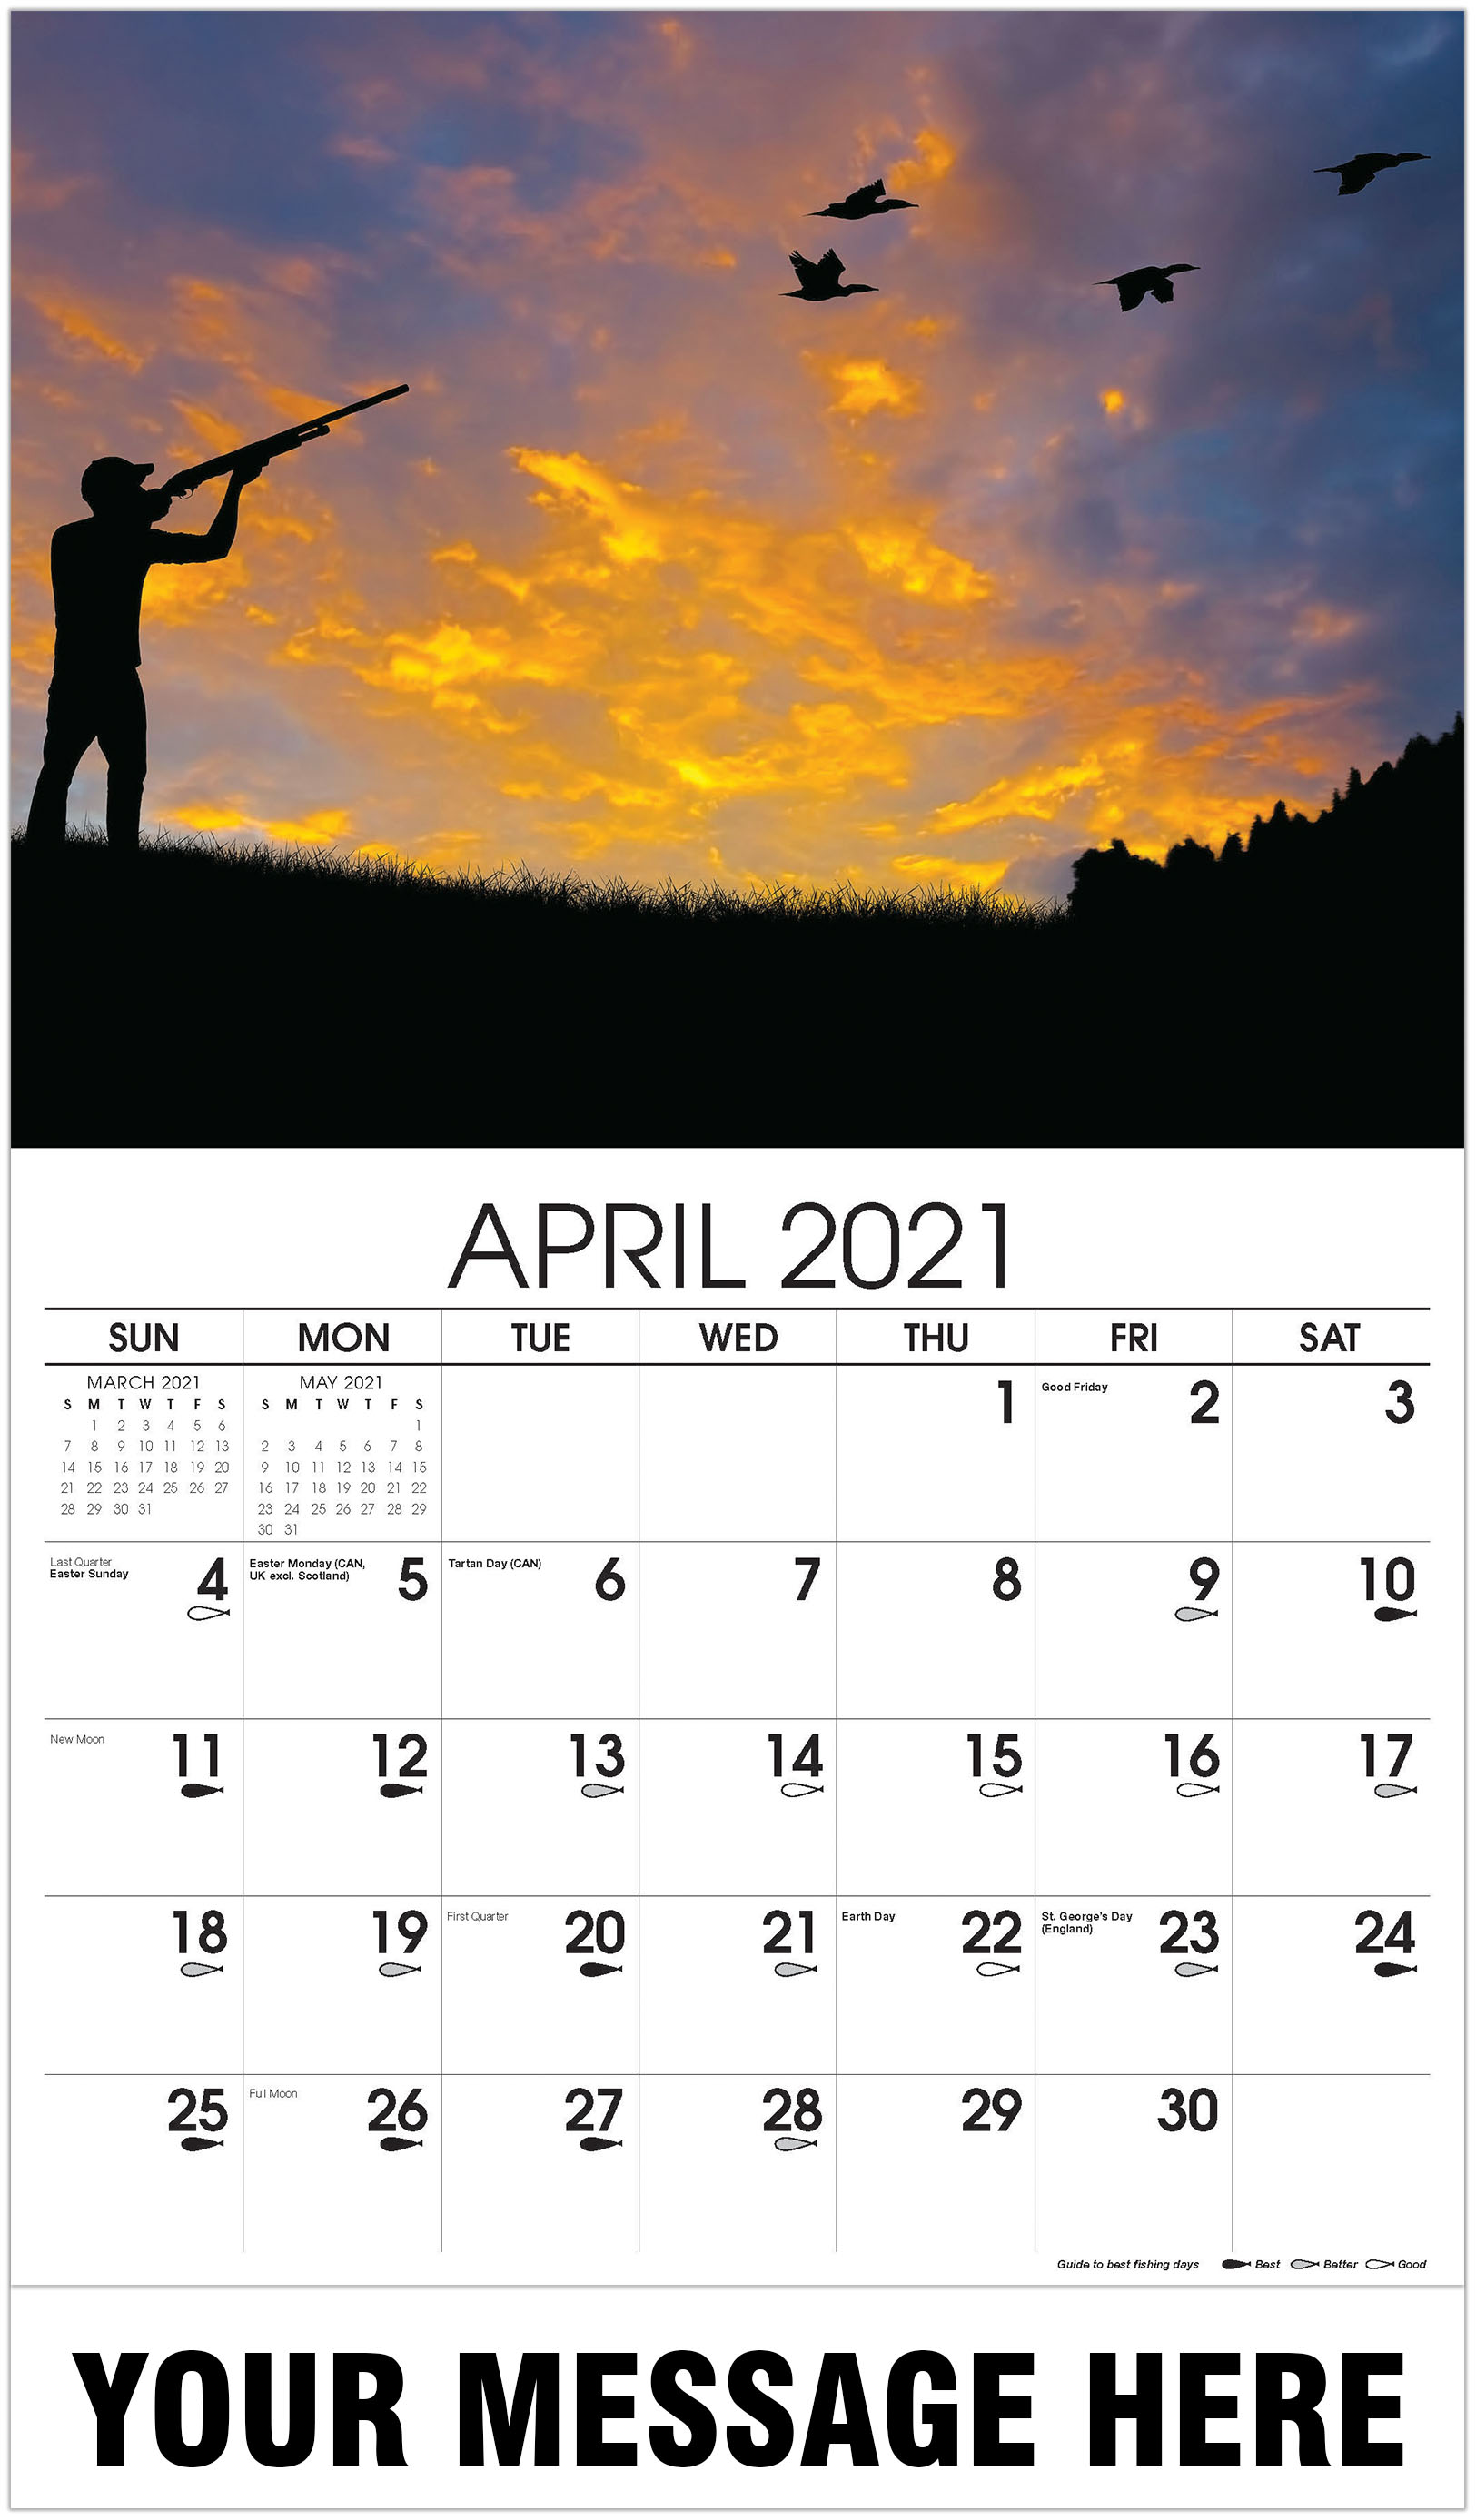 Bird Hunting Silhouette - April - Fishing & Hunting 2021 Promotional Calendar